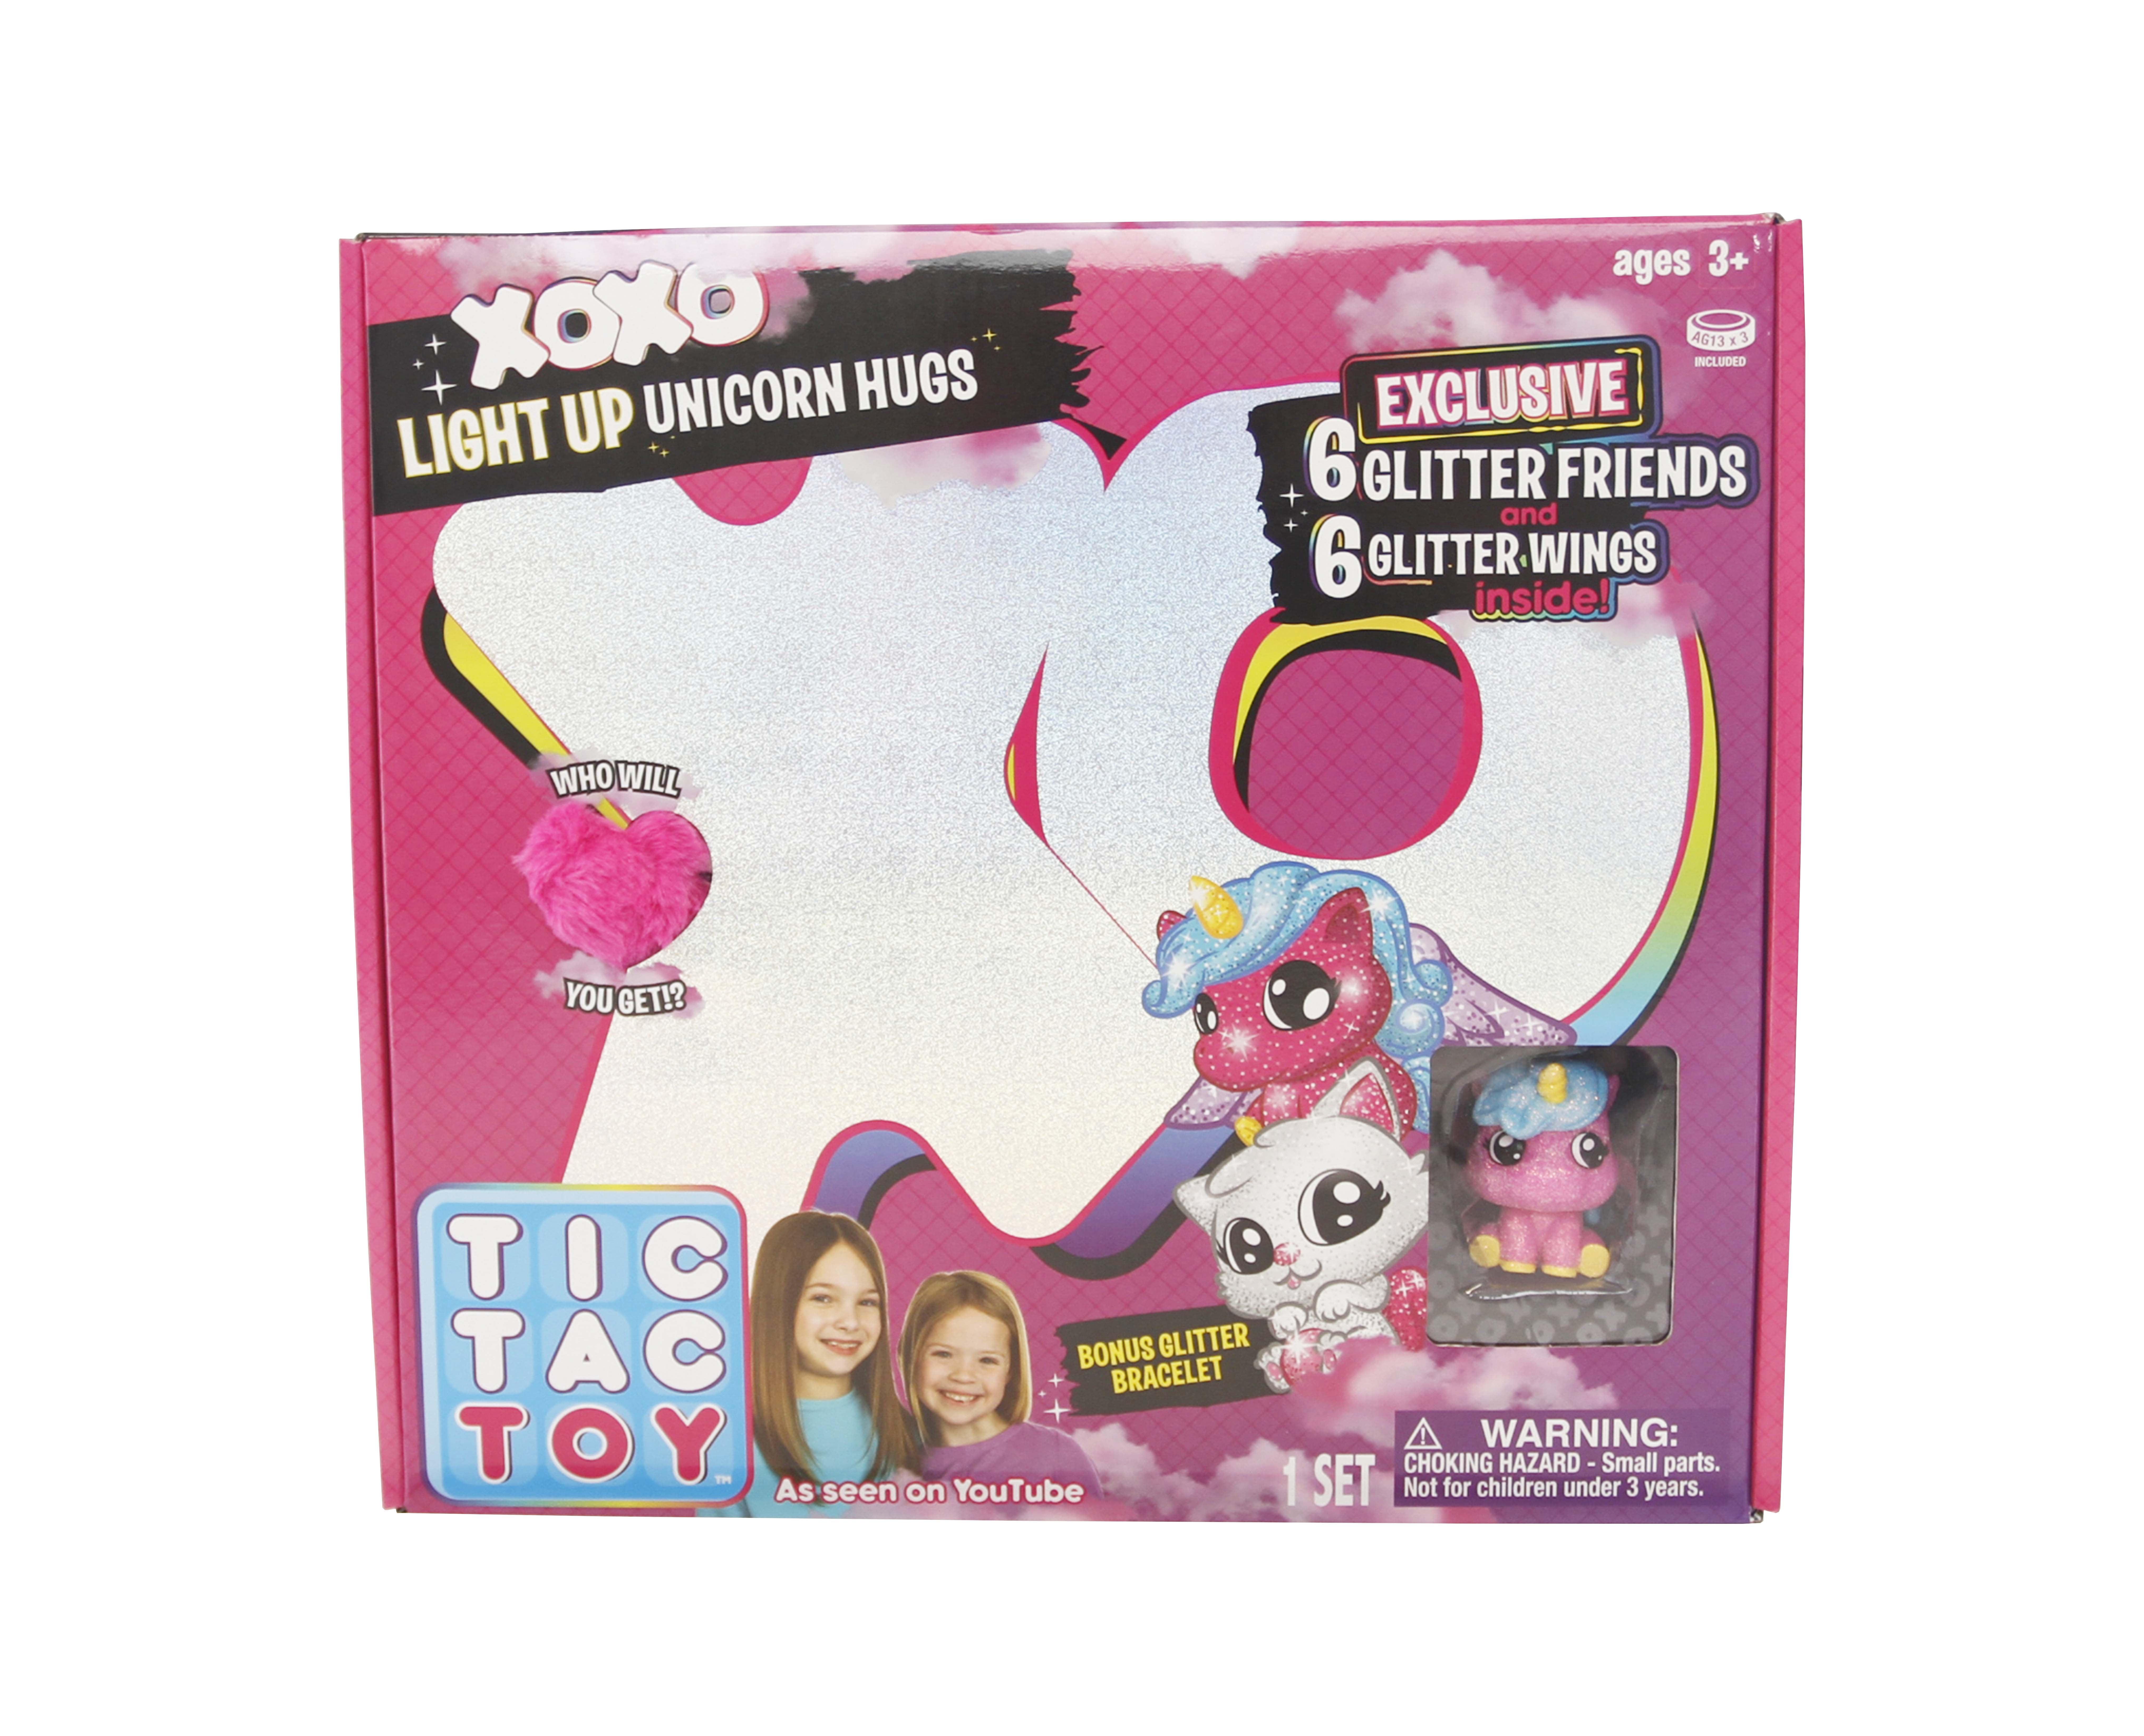 Tic Tac Toy XOXO Light Up Pink Unicorn Hugs & Glitter Friends